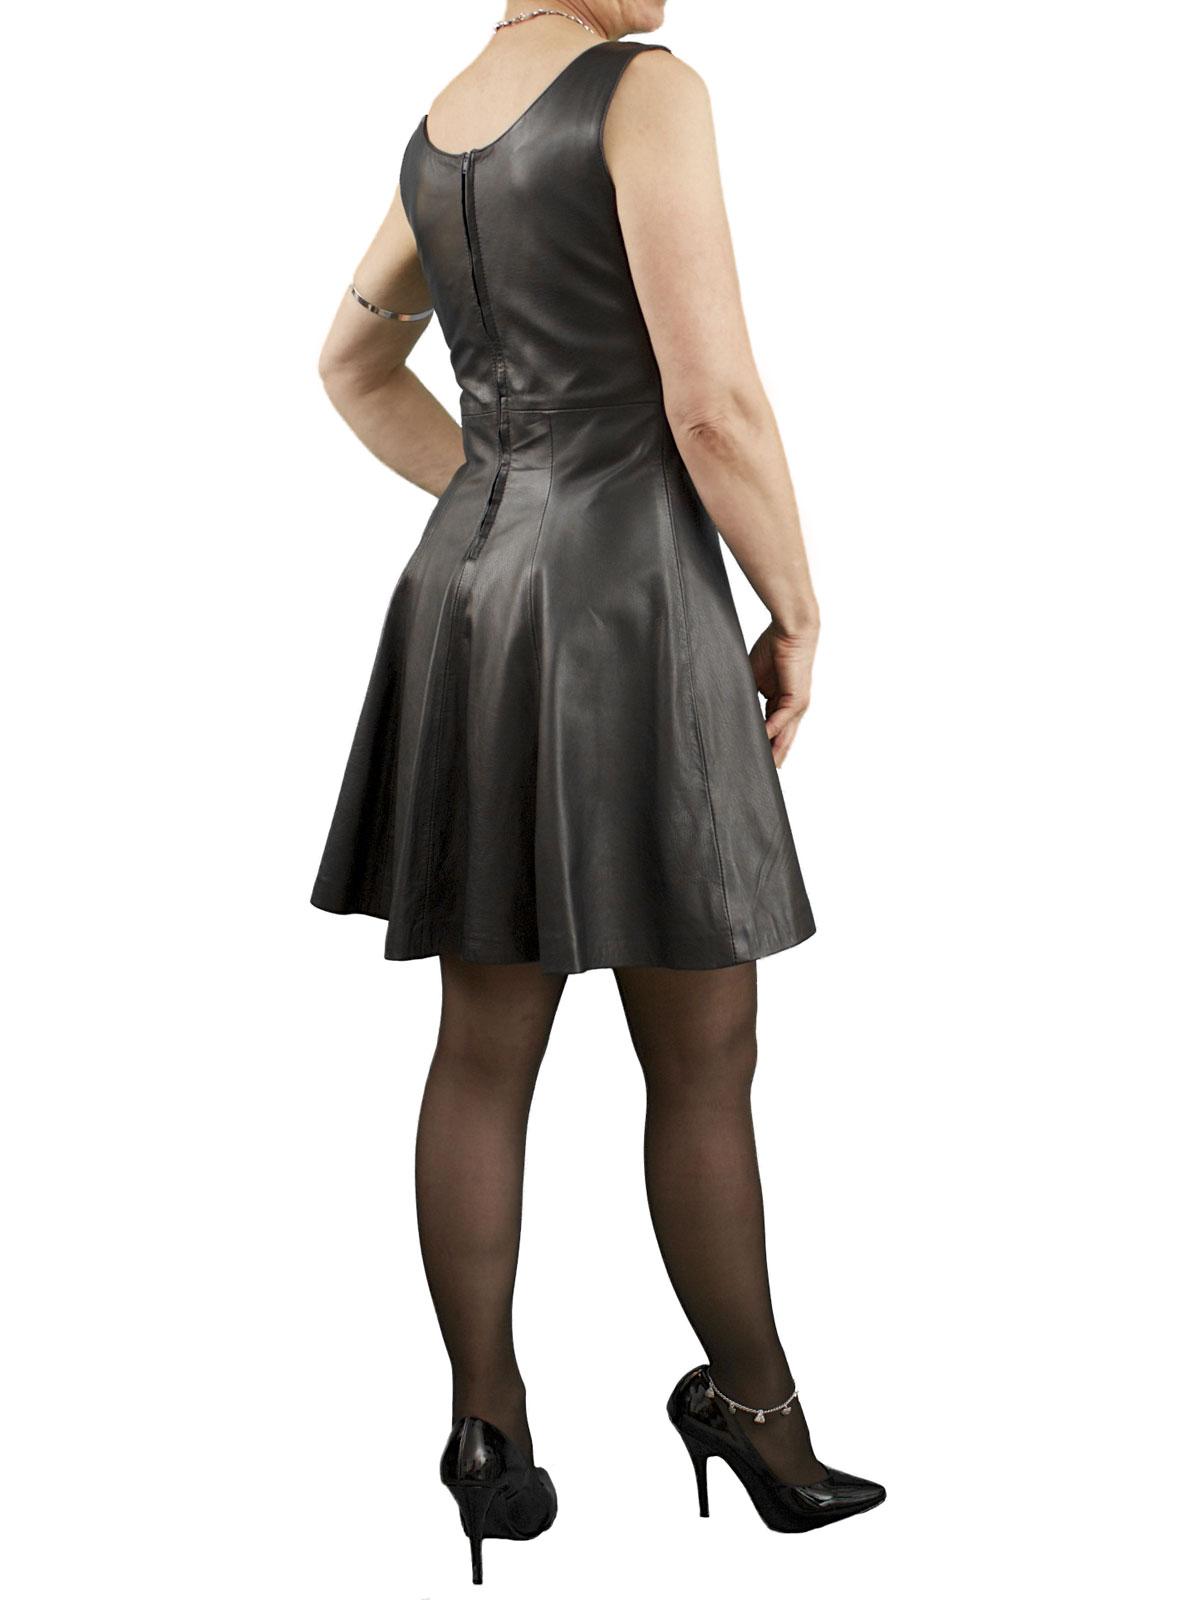 Schoolgirl Pinafore Black Mini Leather Dress Tout Ensemble